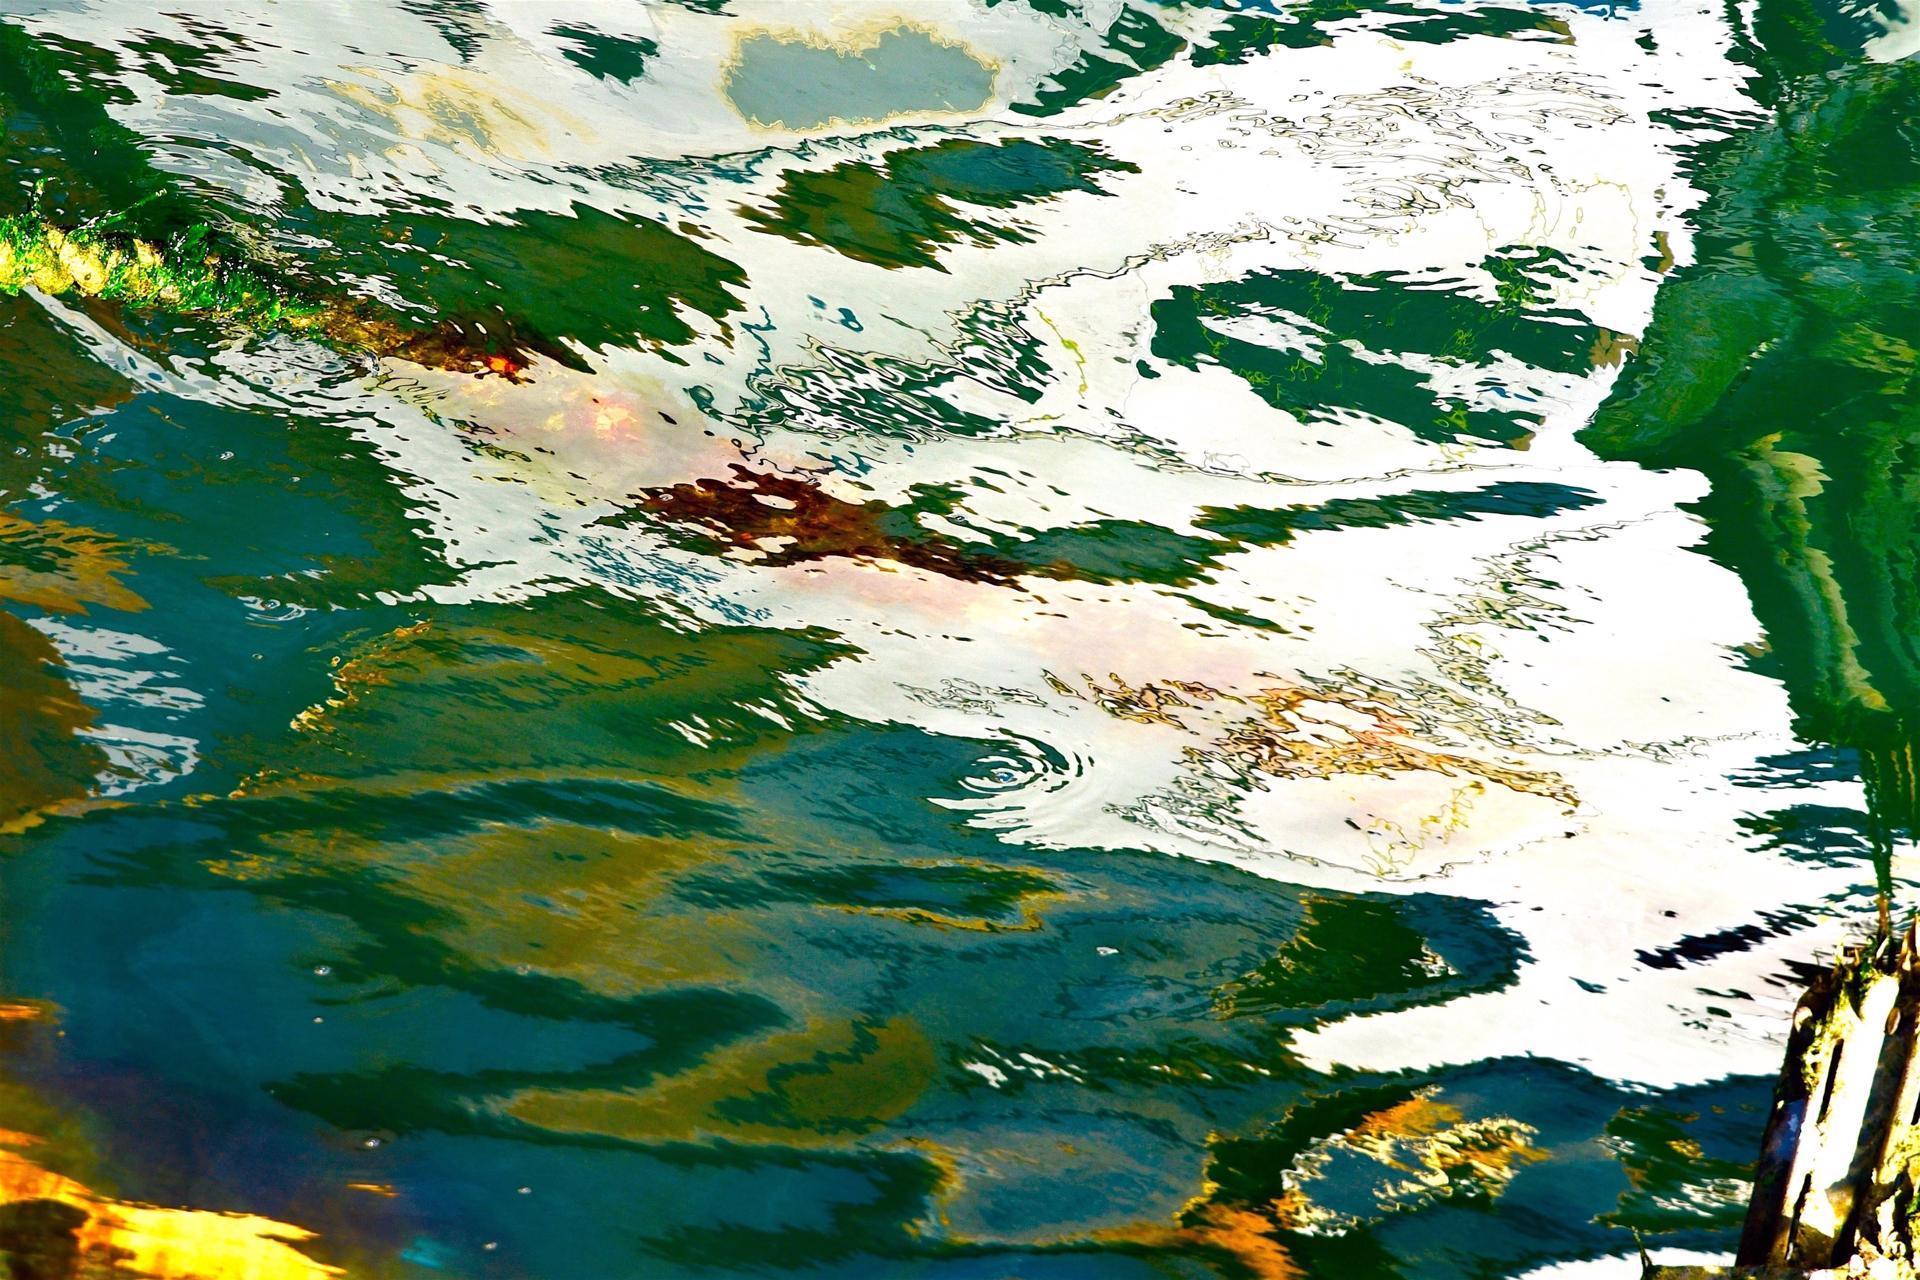 Montauk Reflections #27 by Kat O'Neill